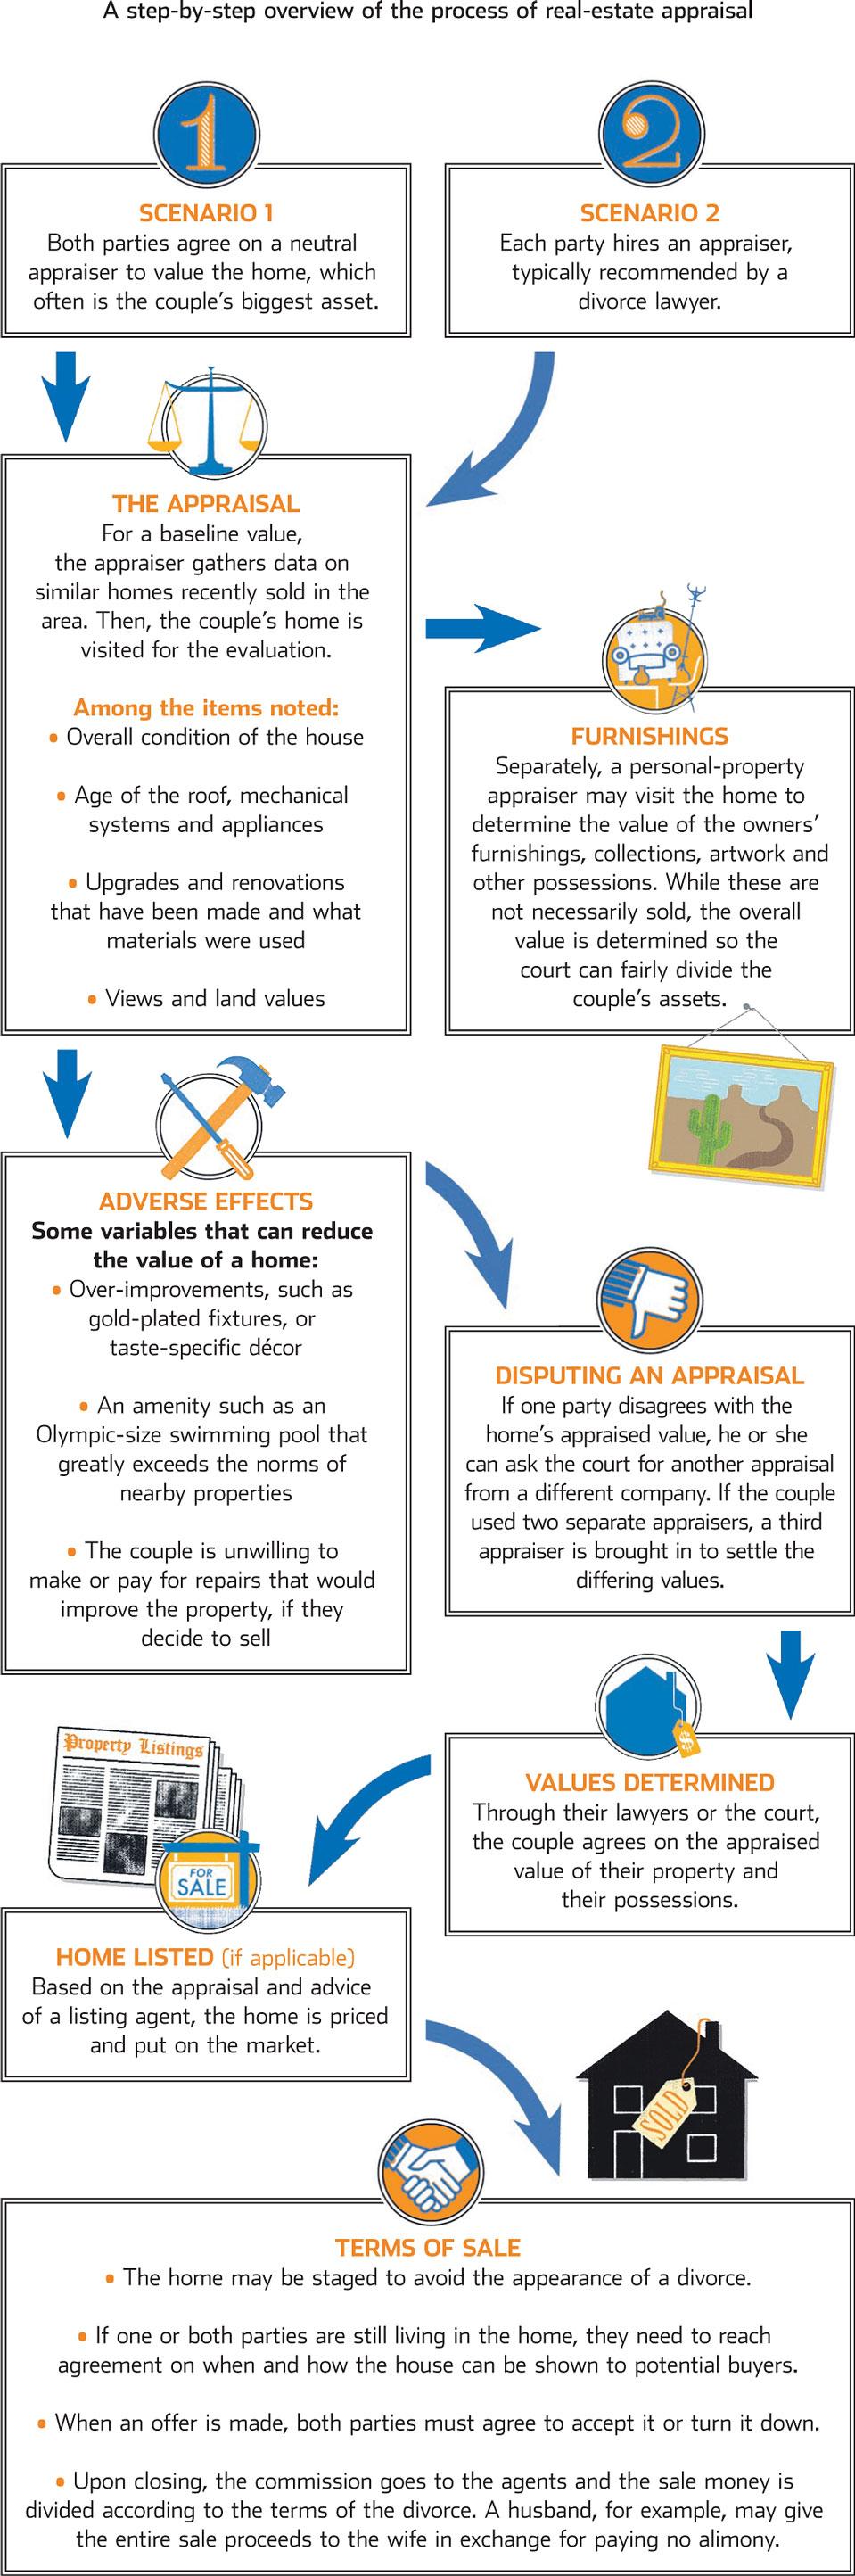 Divorce – Miller Samuel Real Estate Appraisers & Consultants